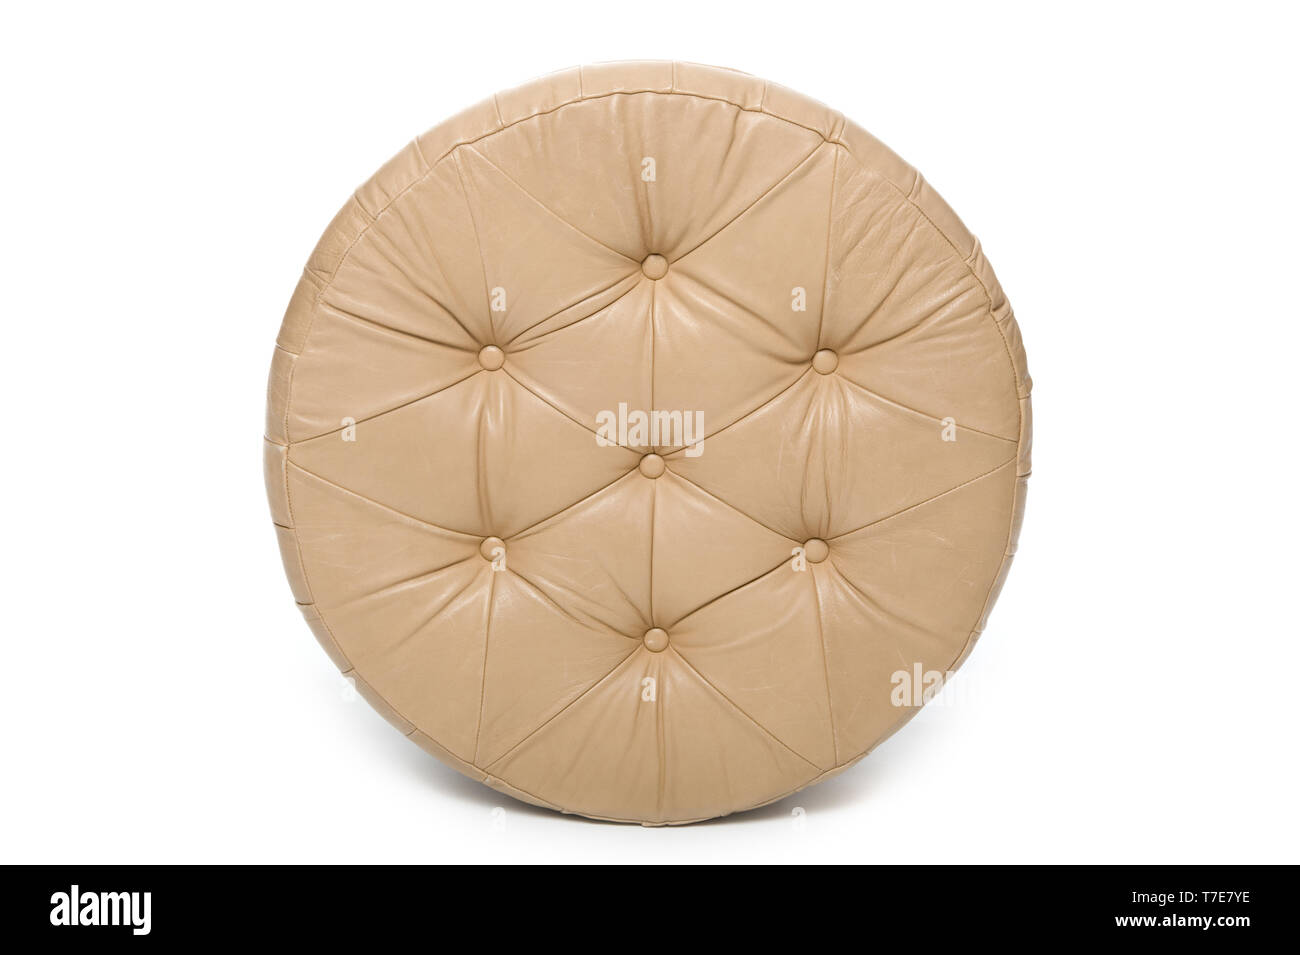 Leather floor stool on white background - Stock Image